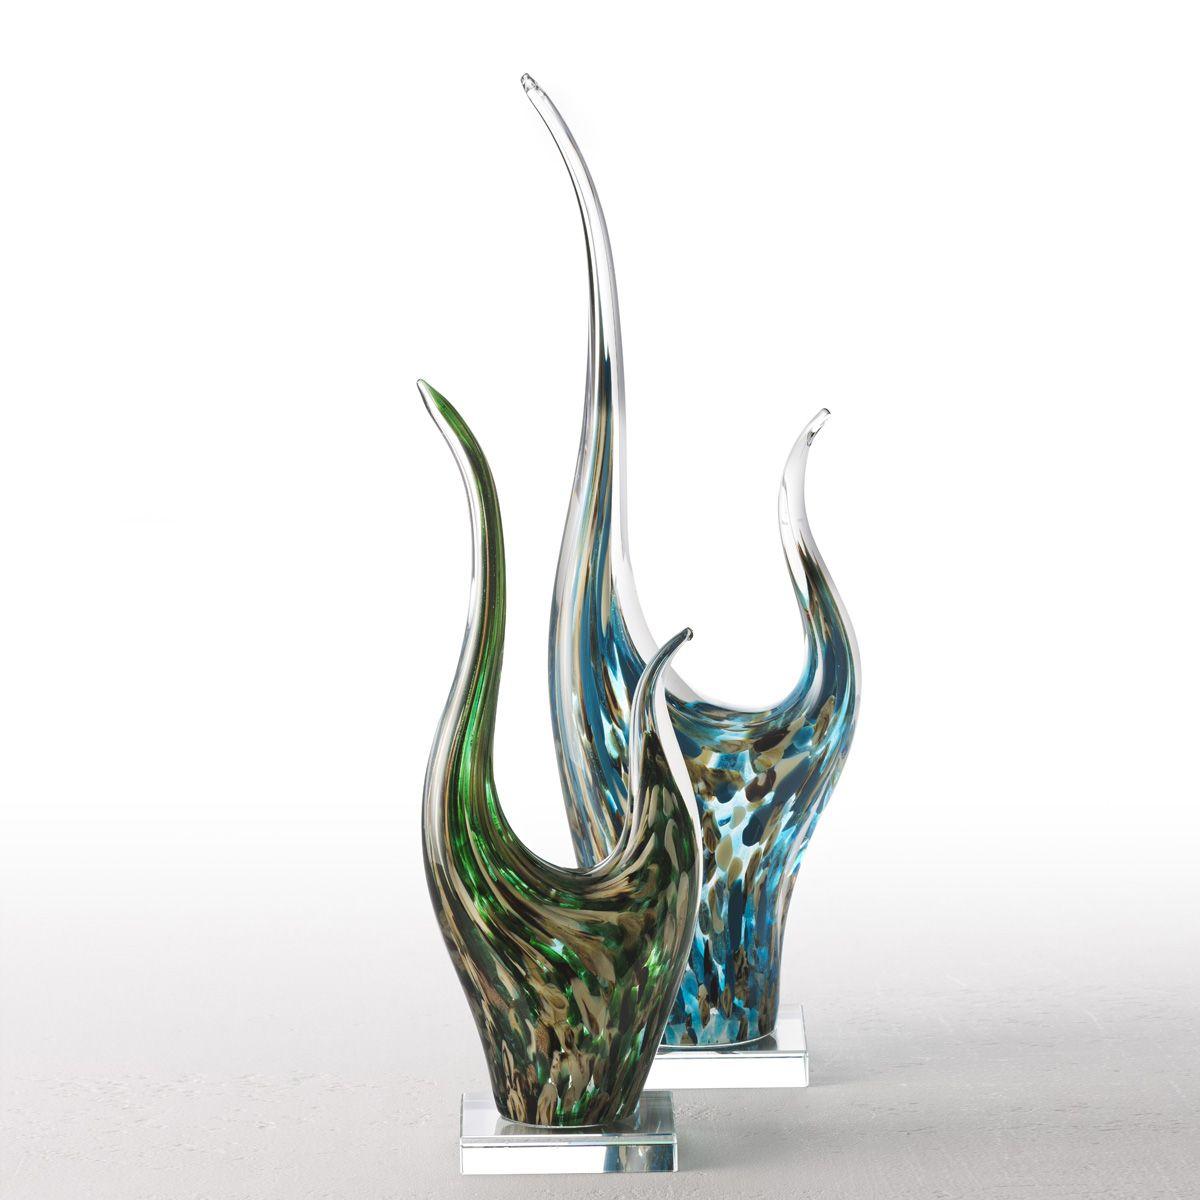 034875 5 k - Statueta decorativă Impulso turquoise 50 cm (L034877)